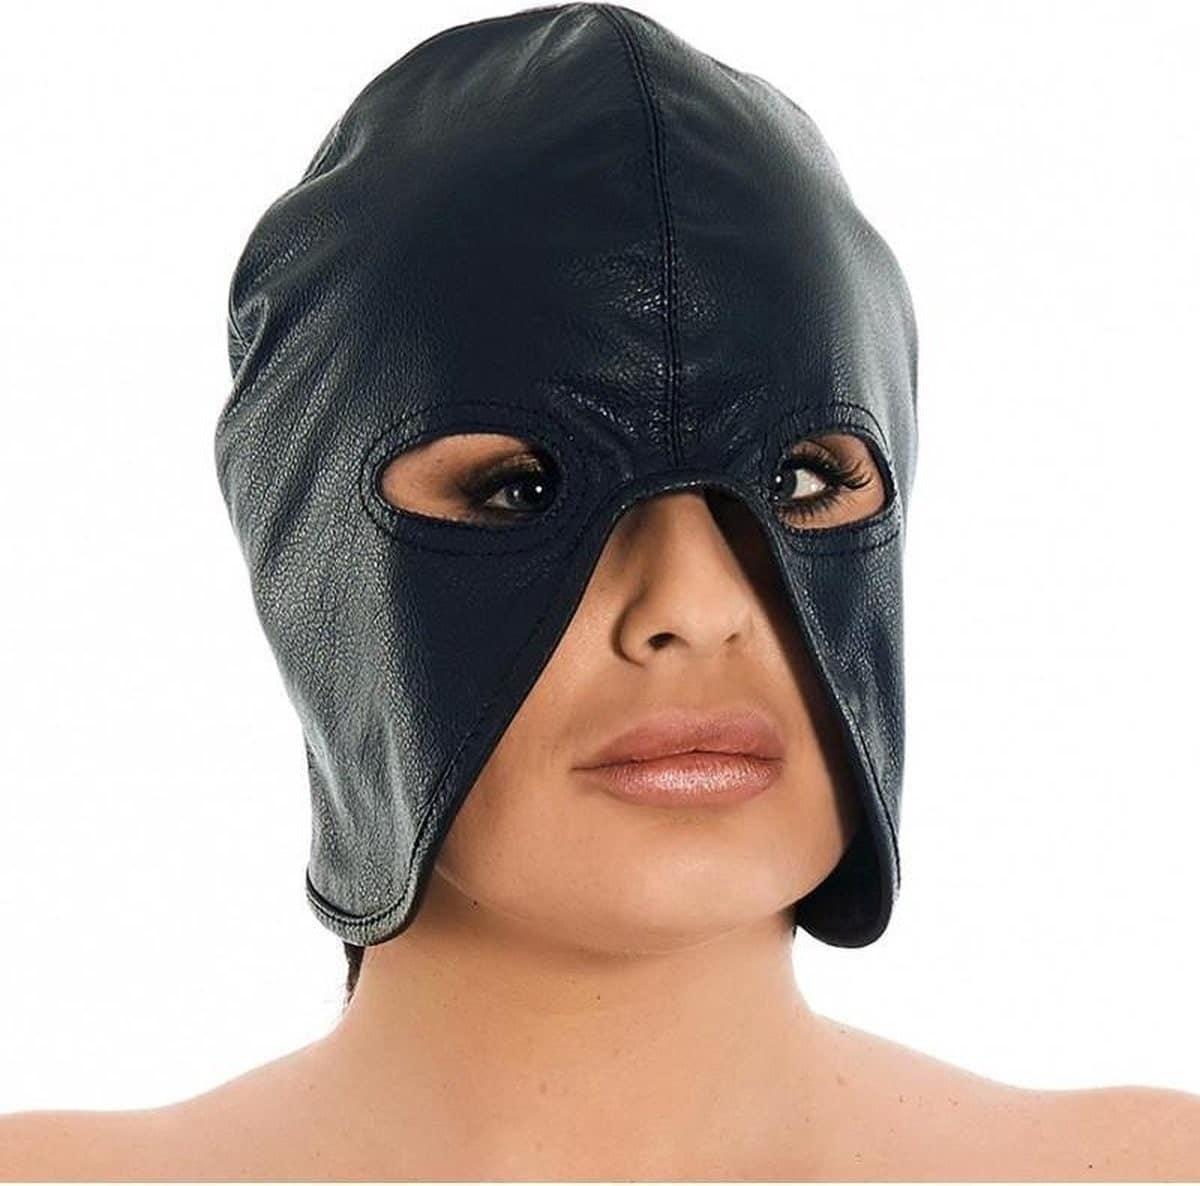 Leather BDSM hood